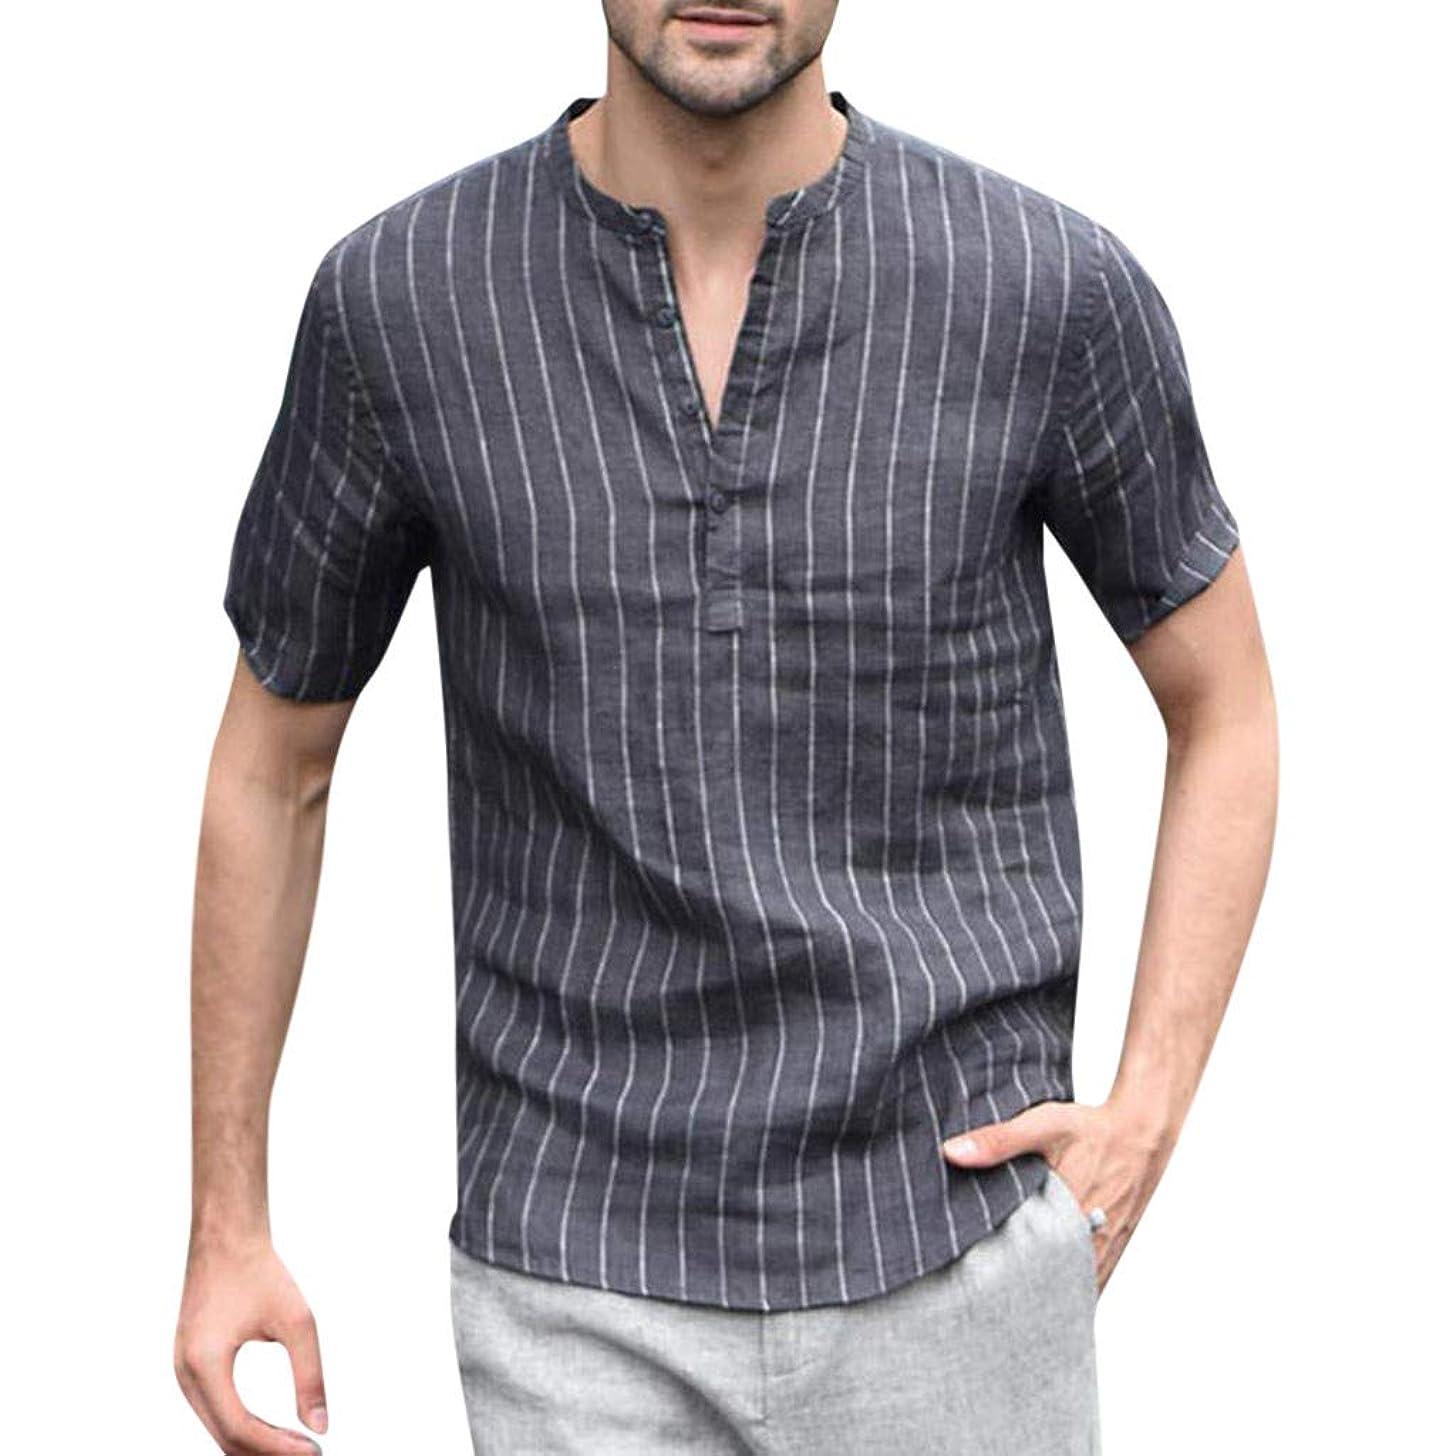 YOMXL Men V-Neck Striped Tops, Ultra Light Cotton Linen Short Sleeve Tops Casual Half Button Down Loose T-Shirt